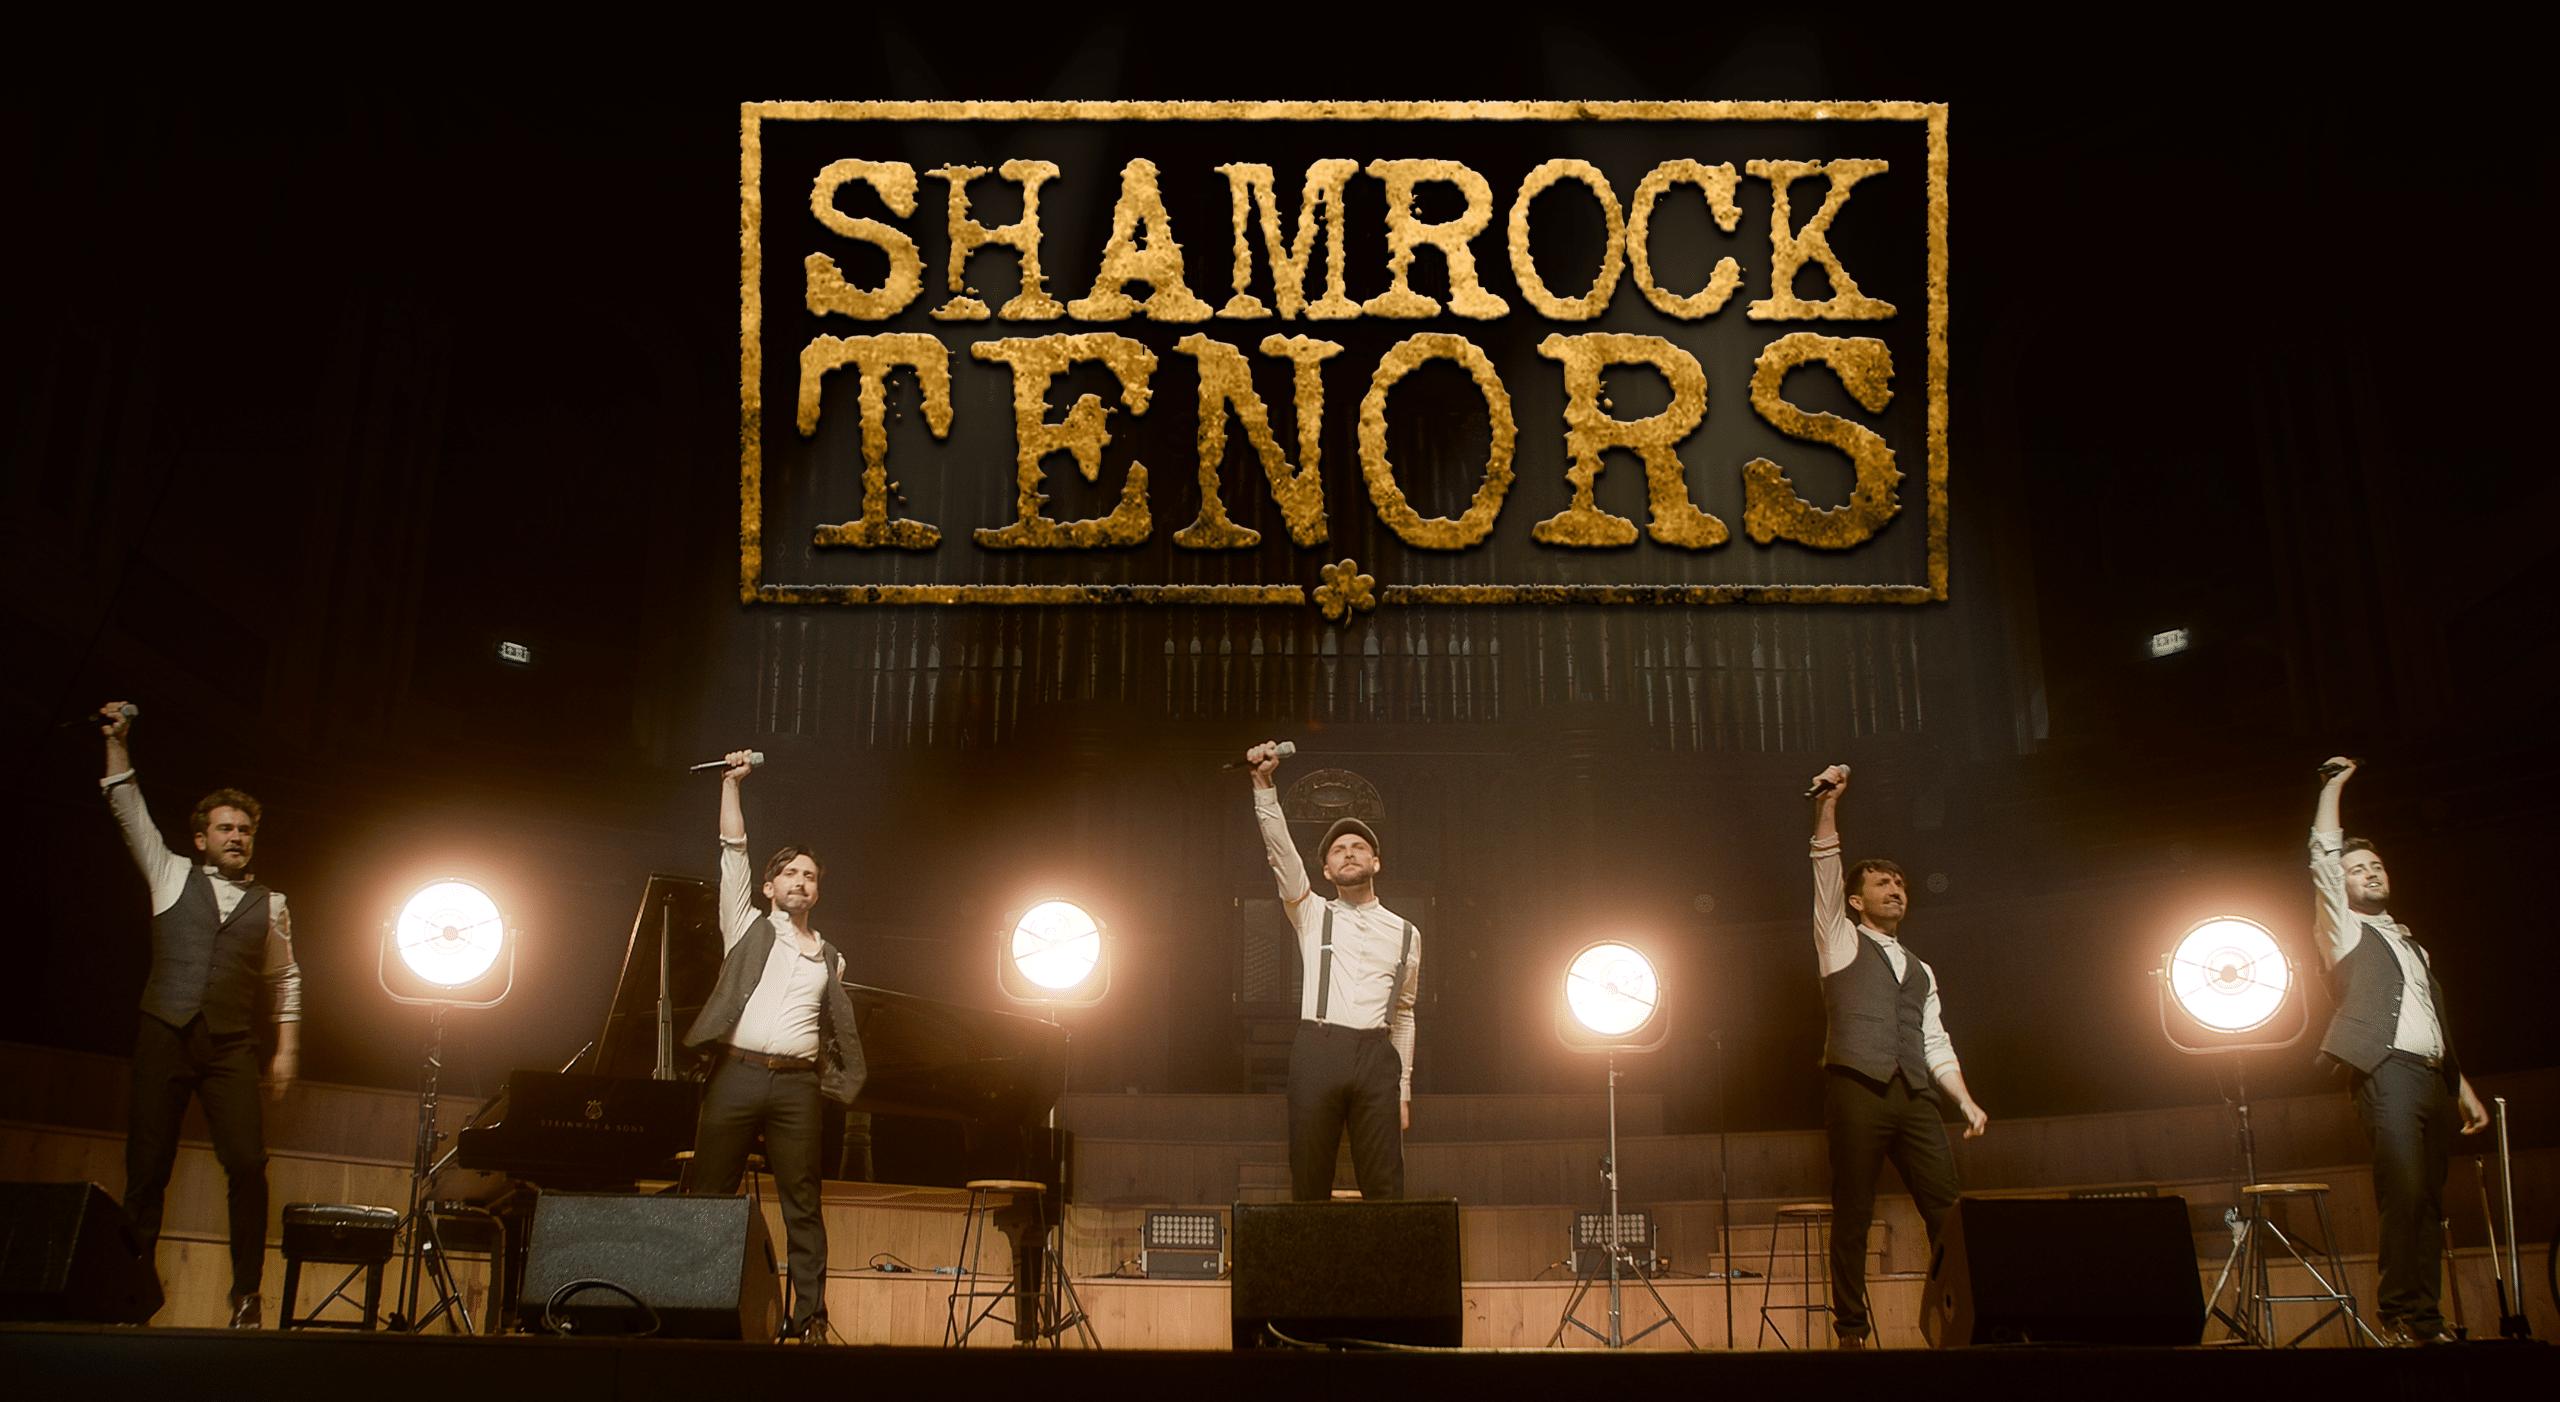 The Shamrock Tenors